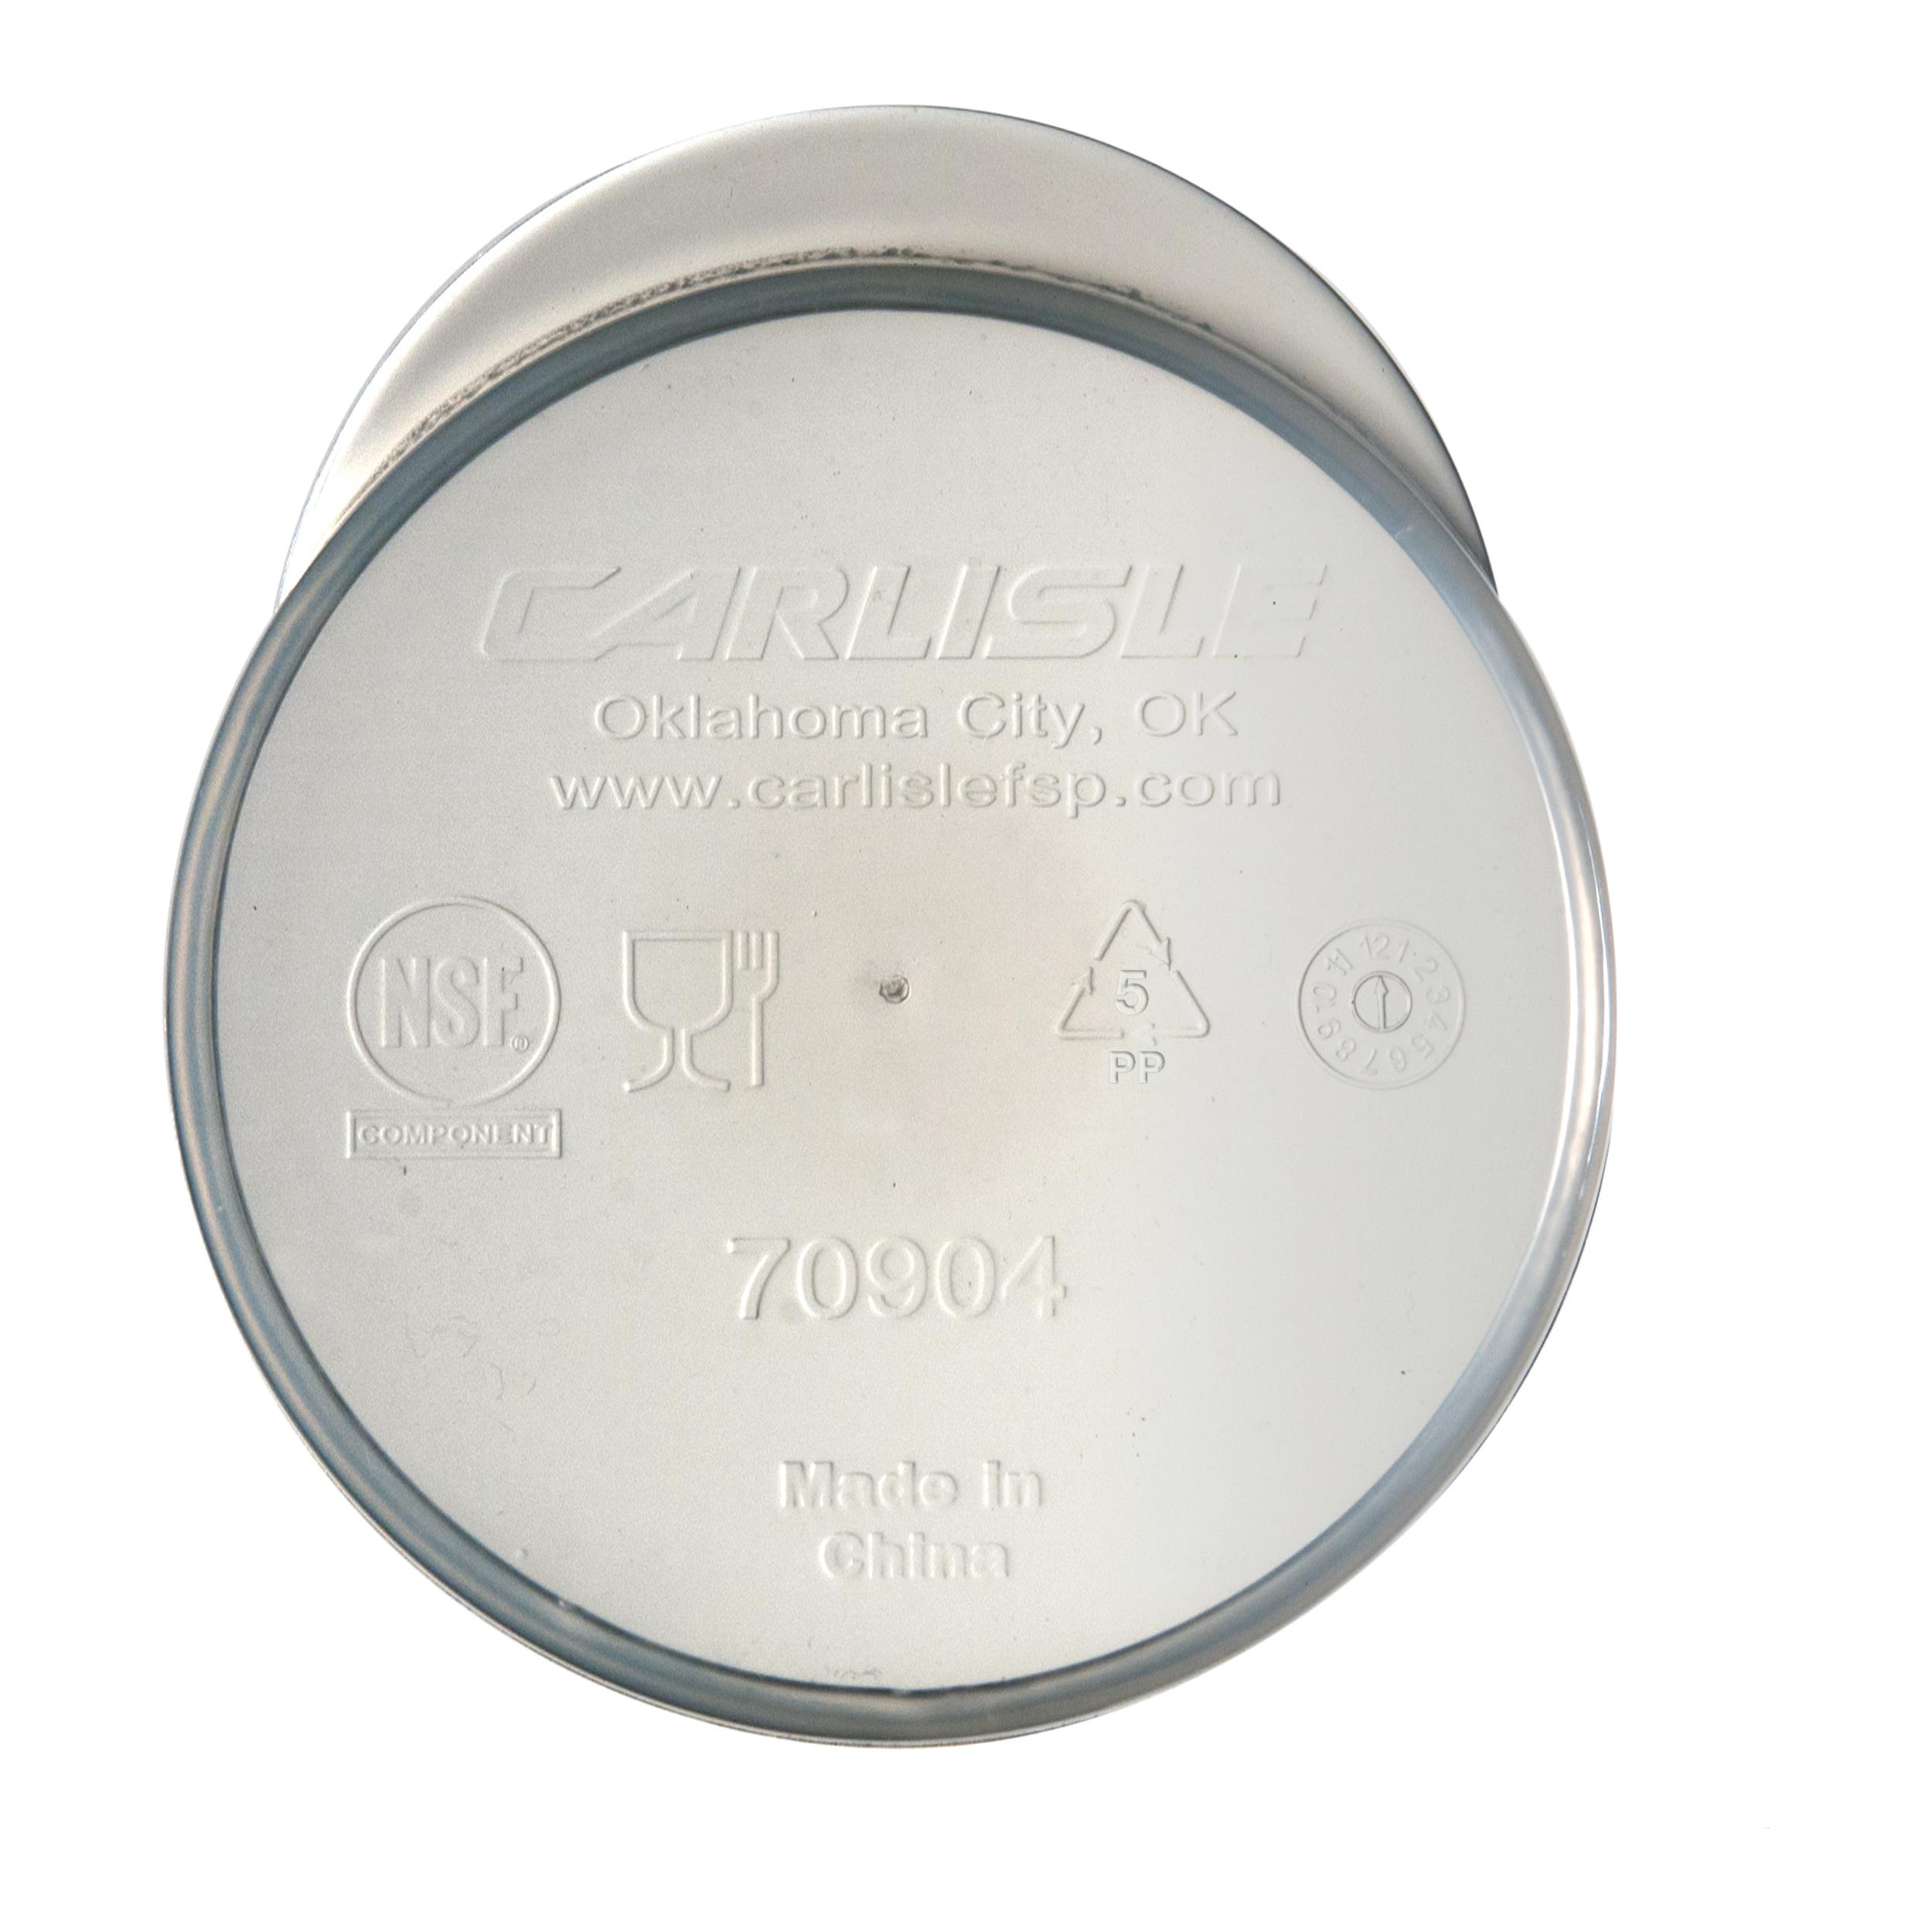 Carlisle 7090402 decanter lid